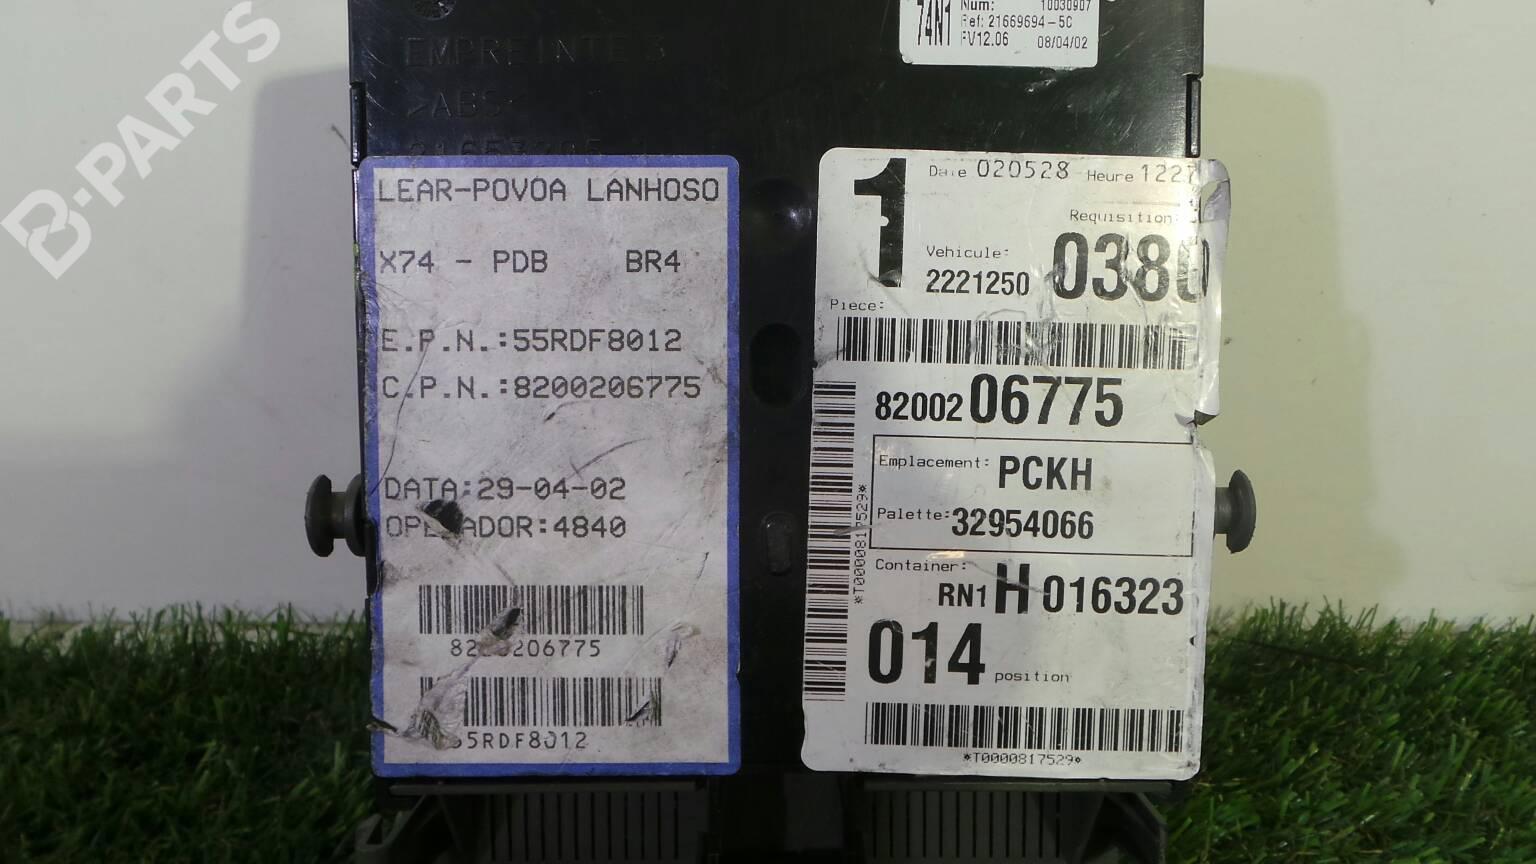 Fuse Box Renault Laguna Ii Bg0 1 19 Dci Bg08 Bg0g 1571585 Cover 8200 004 201 E